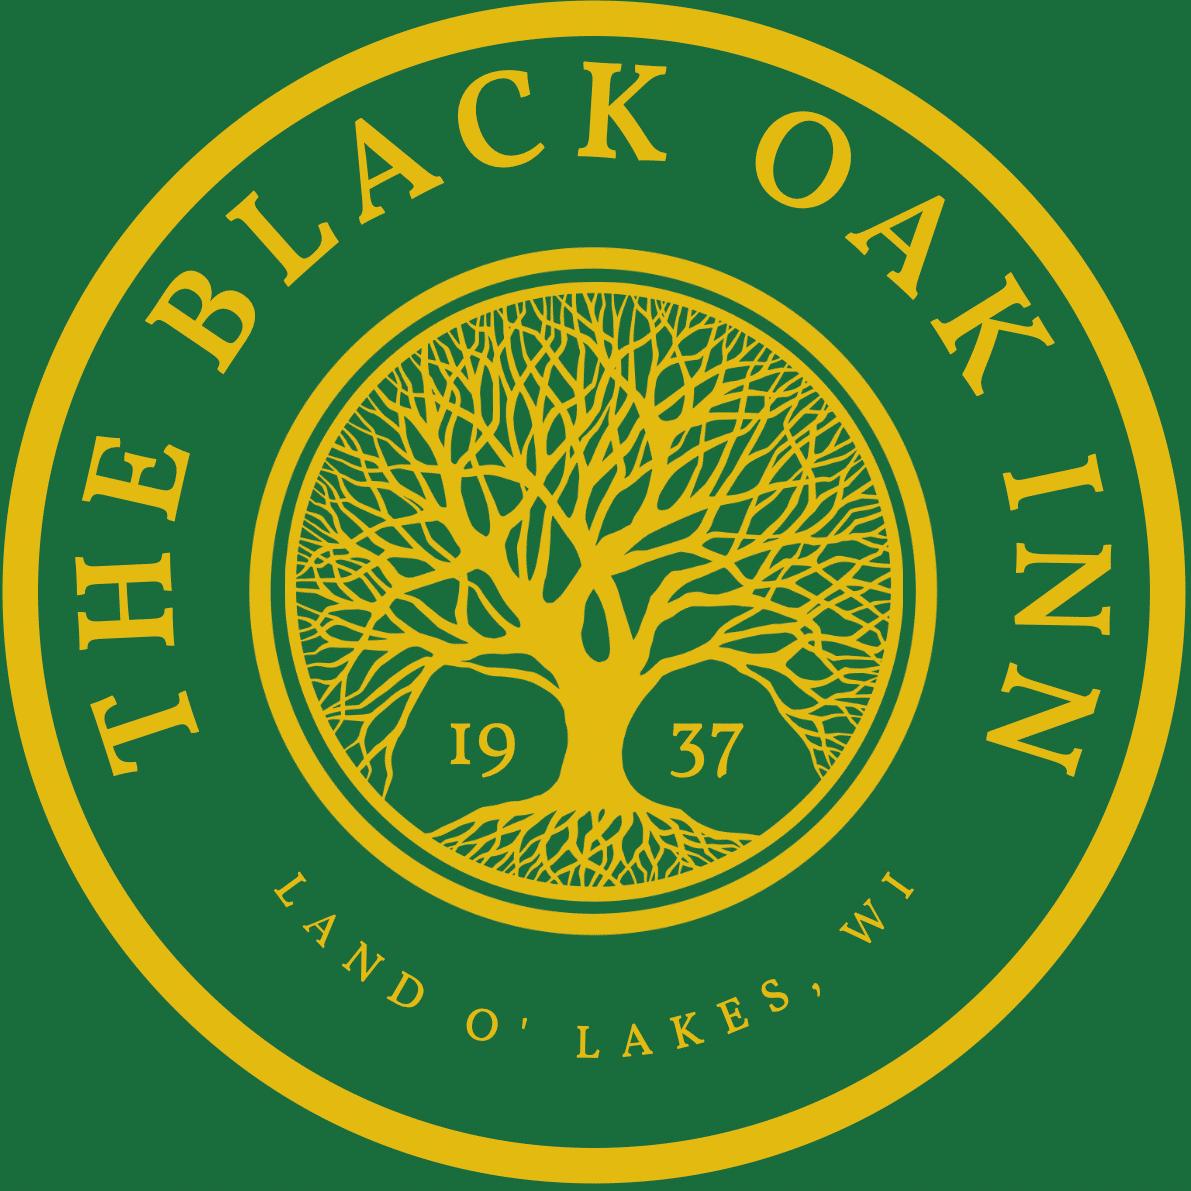 Black oak inn